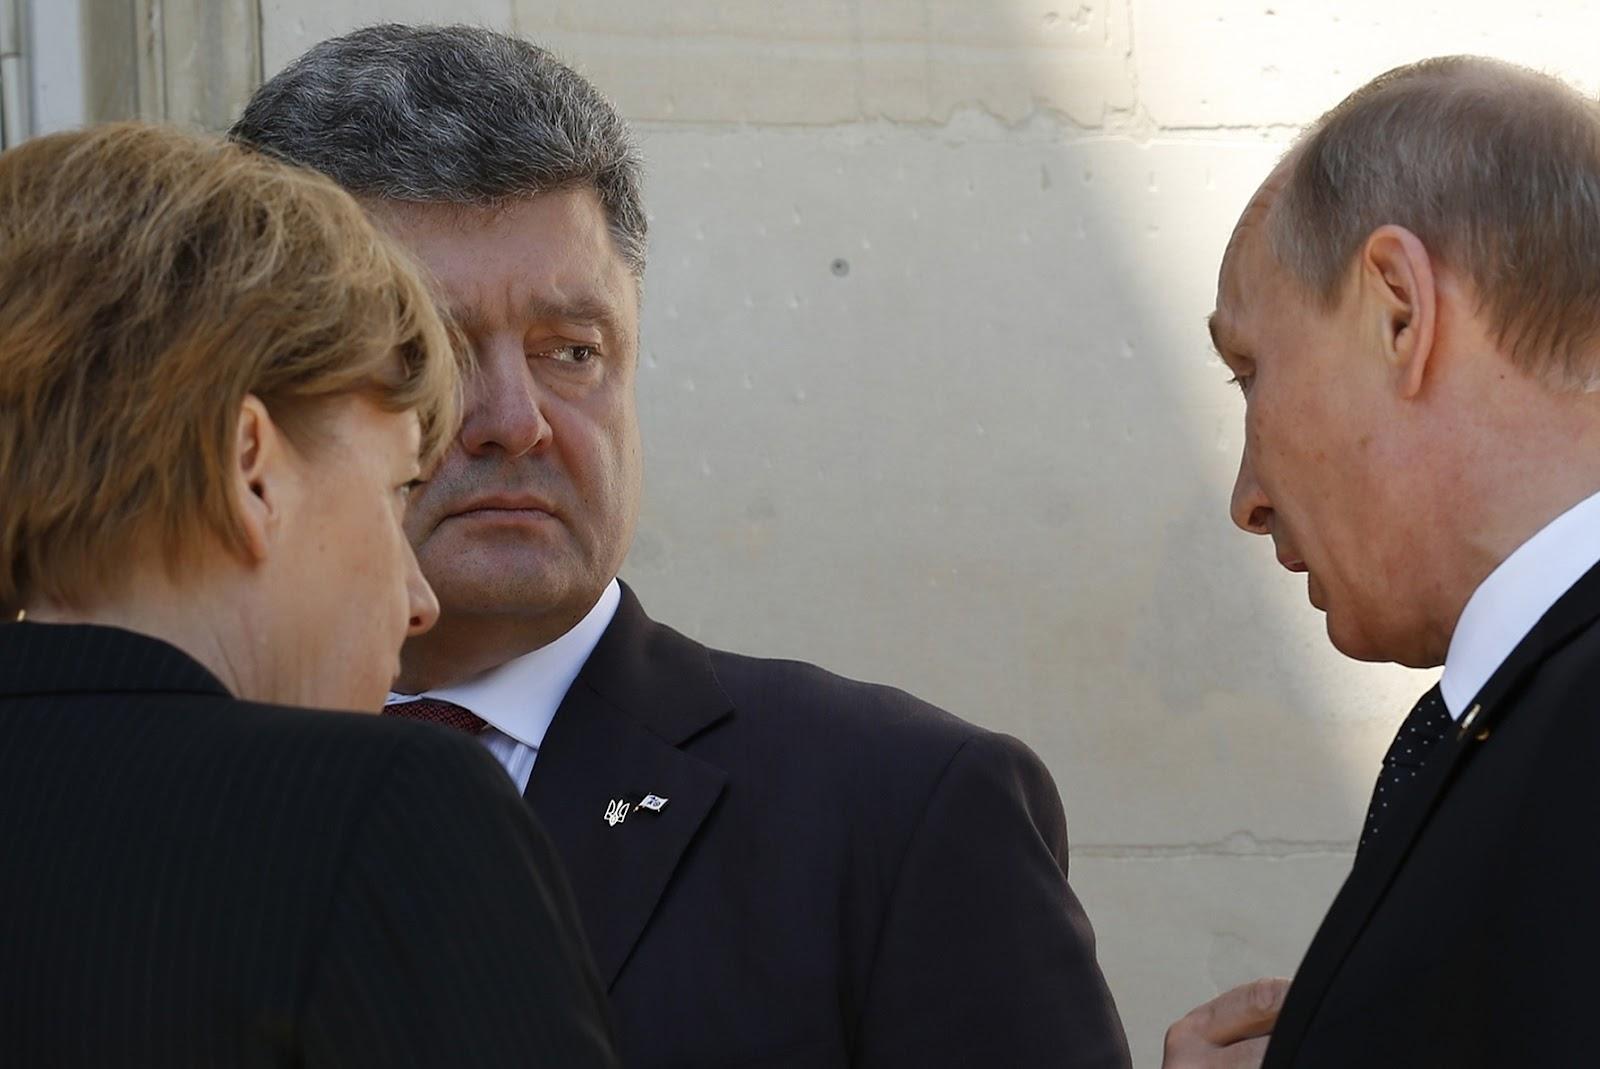 Putin, Poroshenko and Merkel talk in Normandy